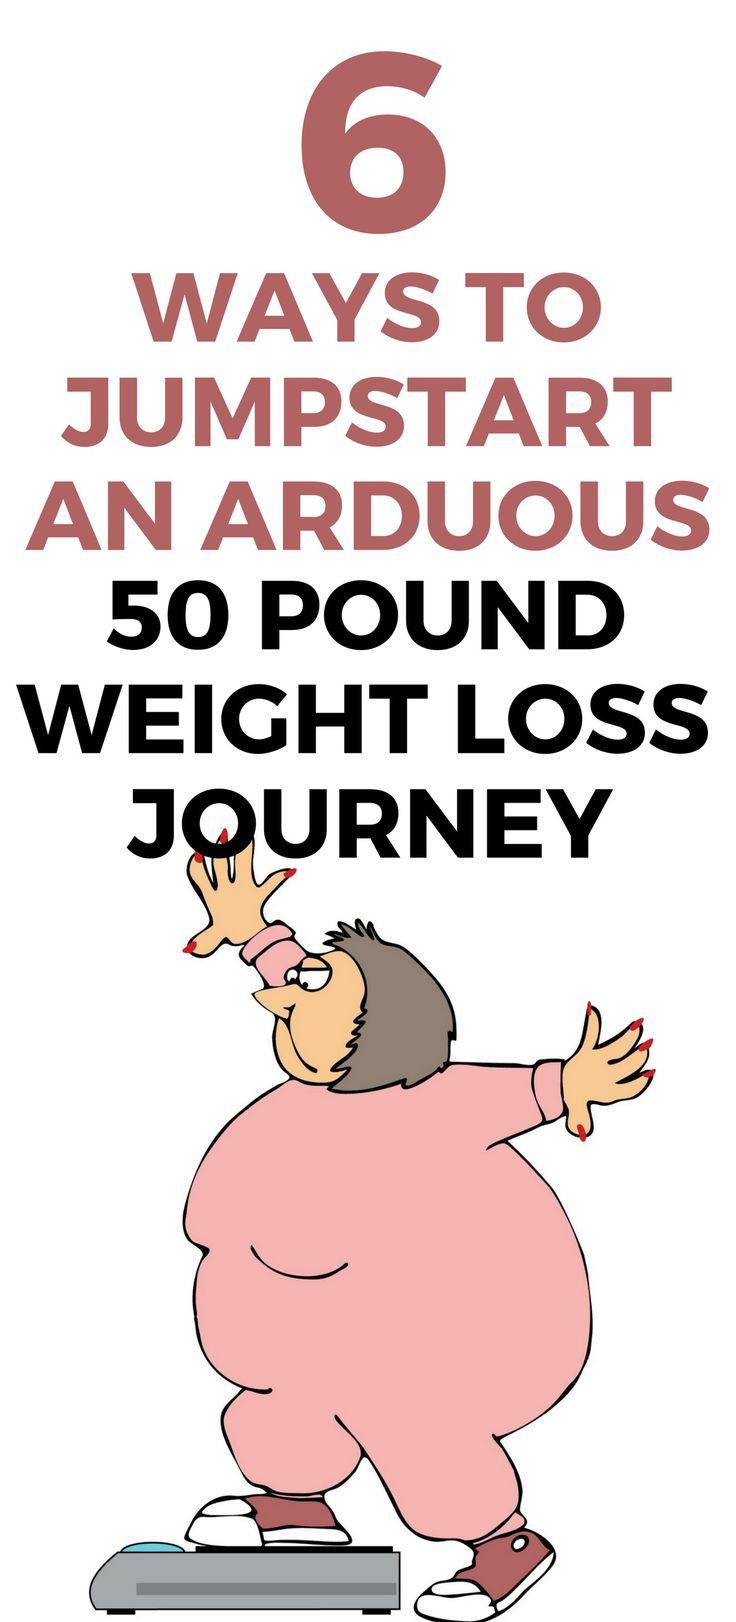 6 ways to jumpstart a 50 pound weight loss journey.